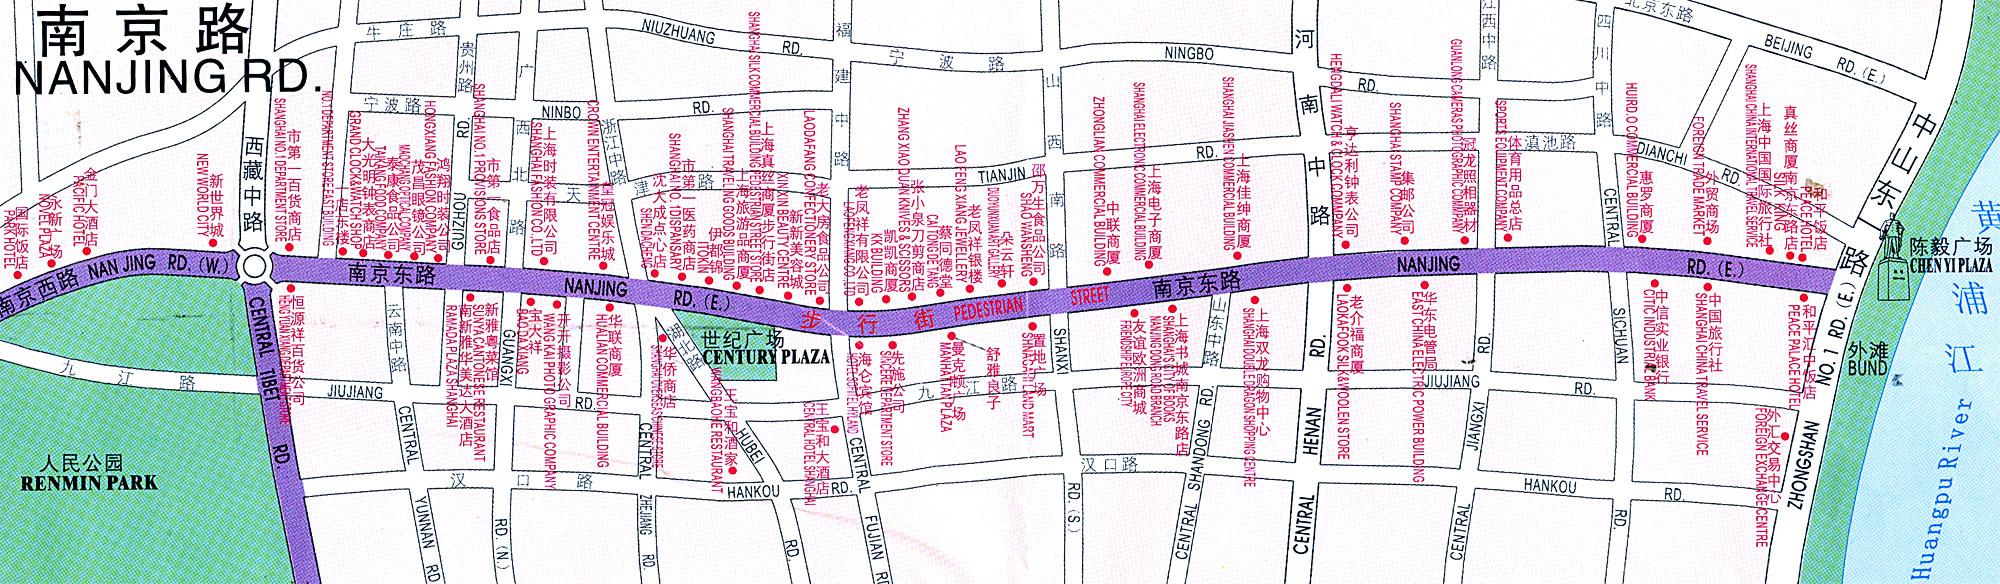 Subway Map Shanghai Tourist.Shanghai Maps Shanghai Street Map Subway Map Airport Map